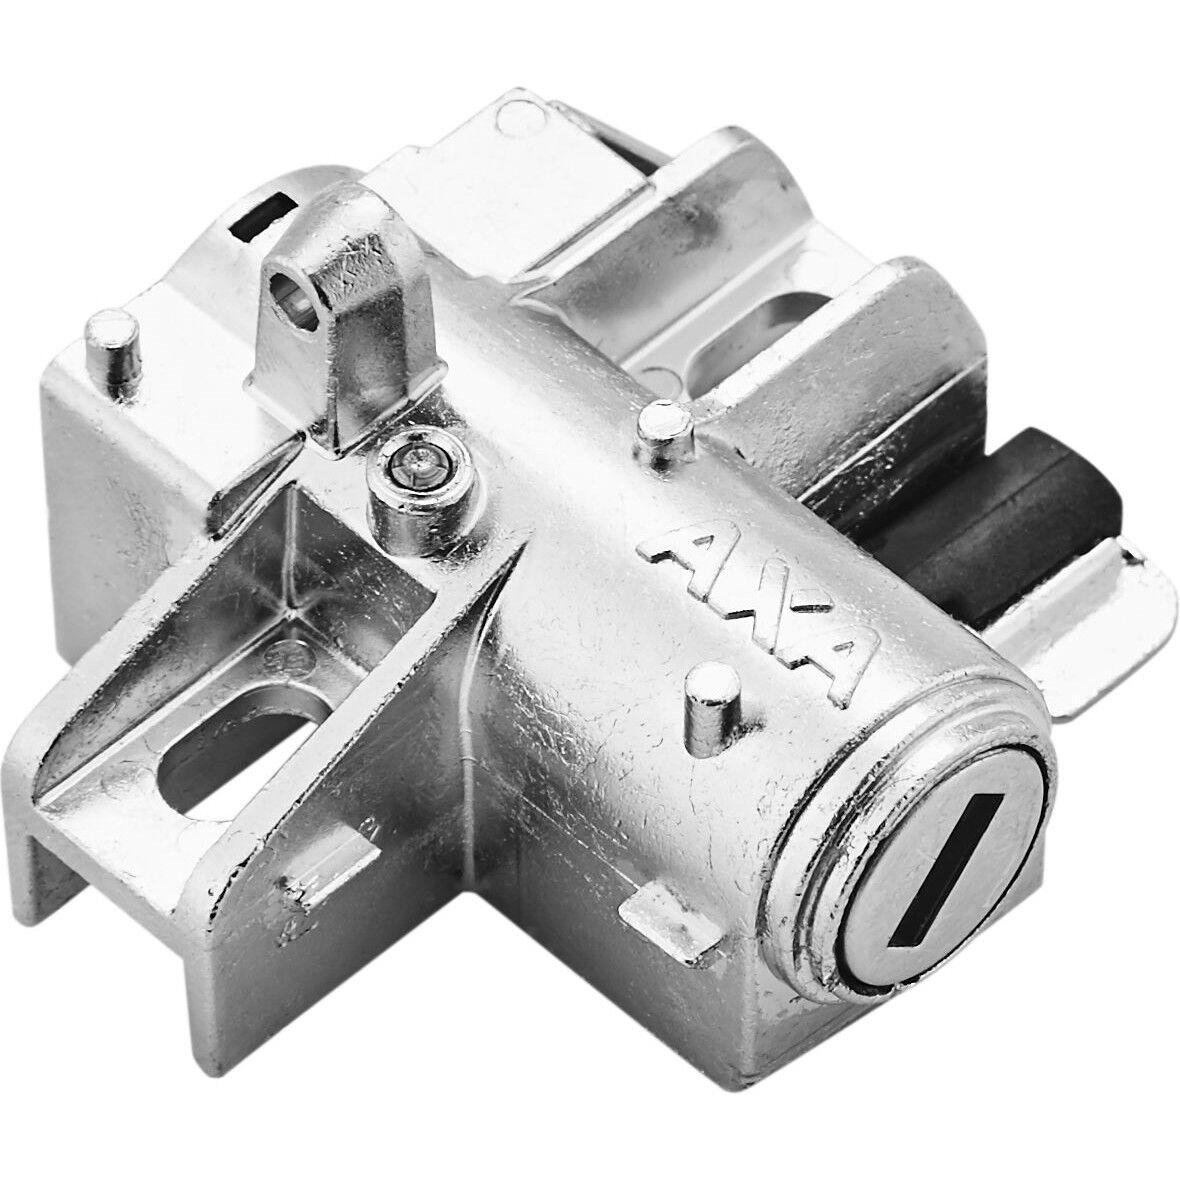 Axa One Key System Rahmenschloss für Bosch Rahmenmontage Schlüssel abziehbar